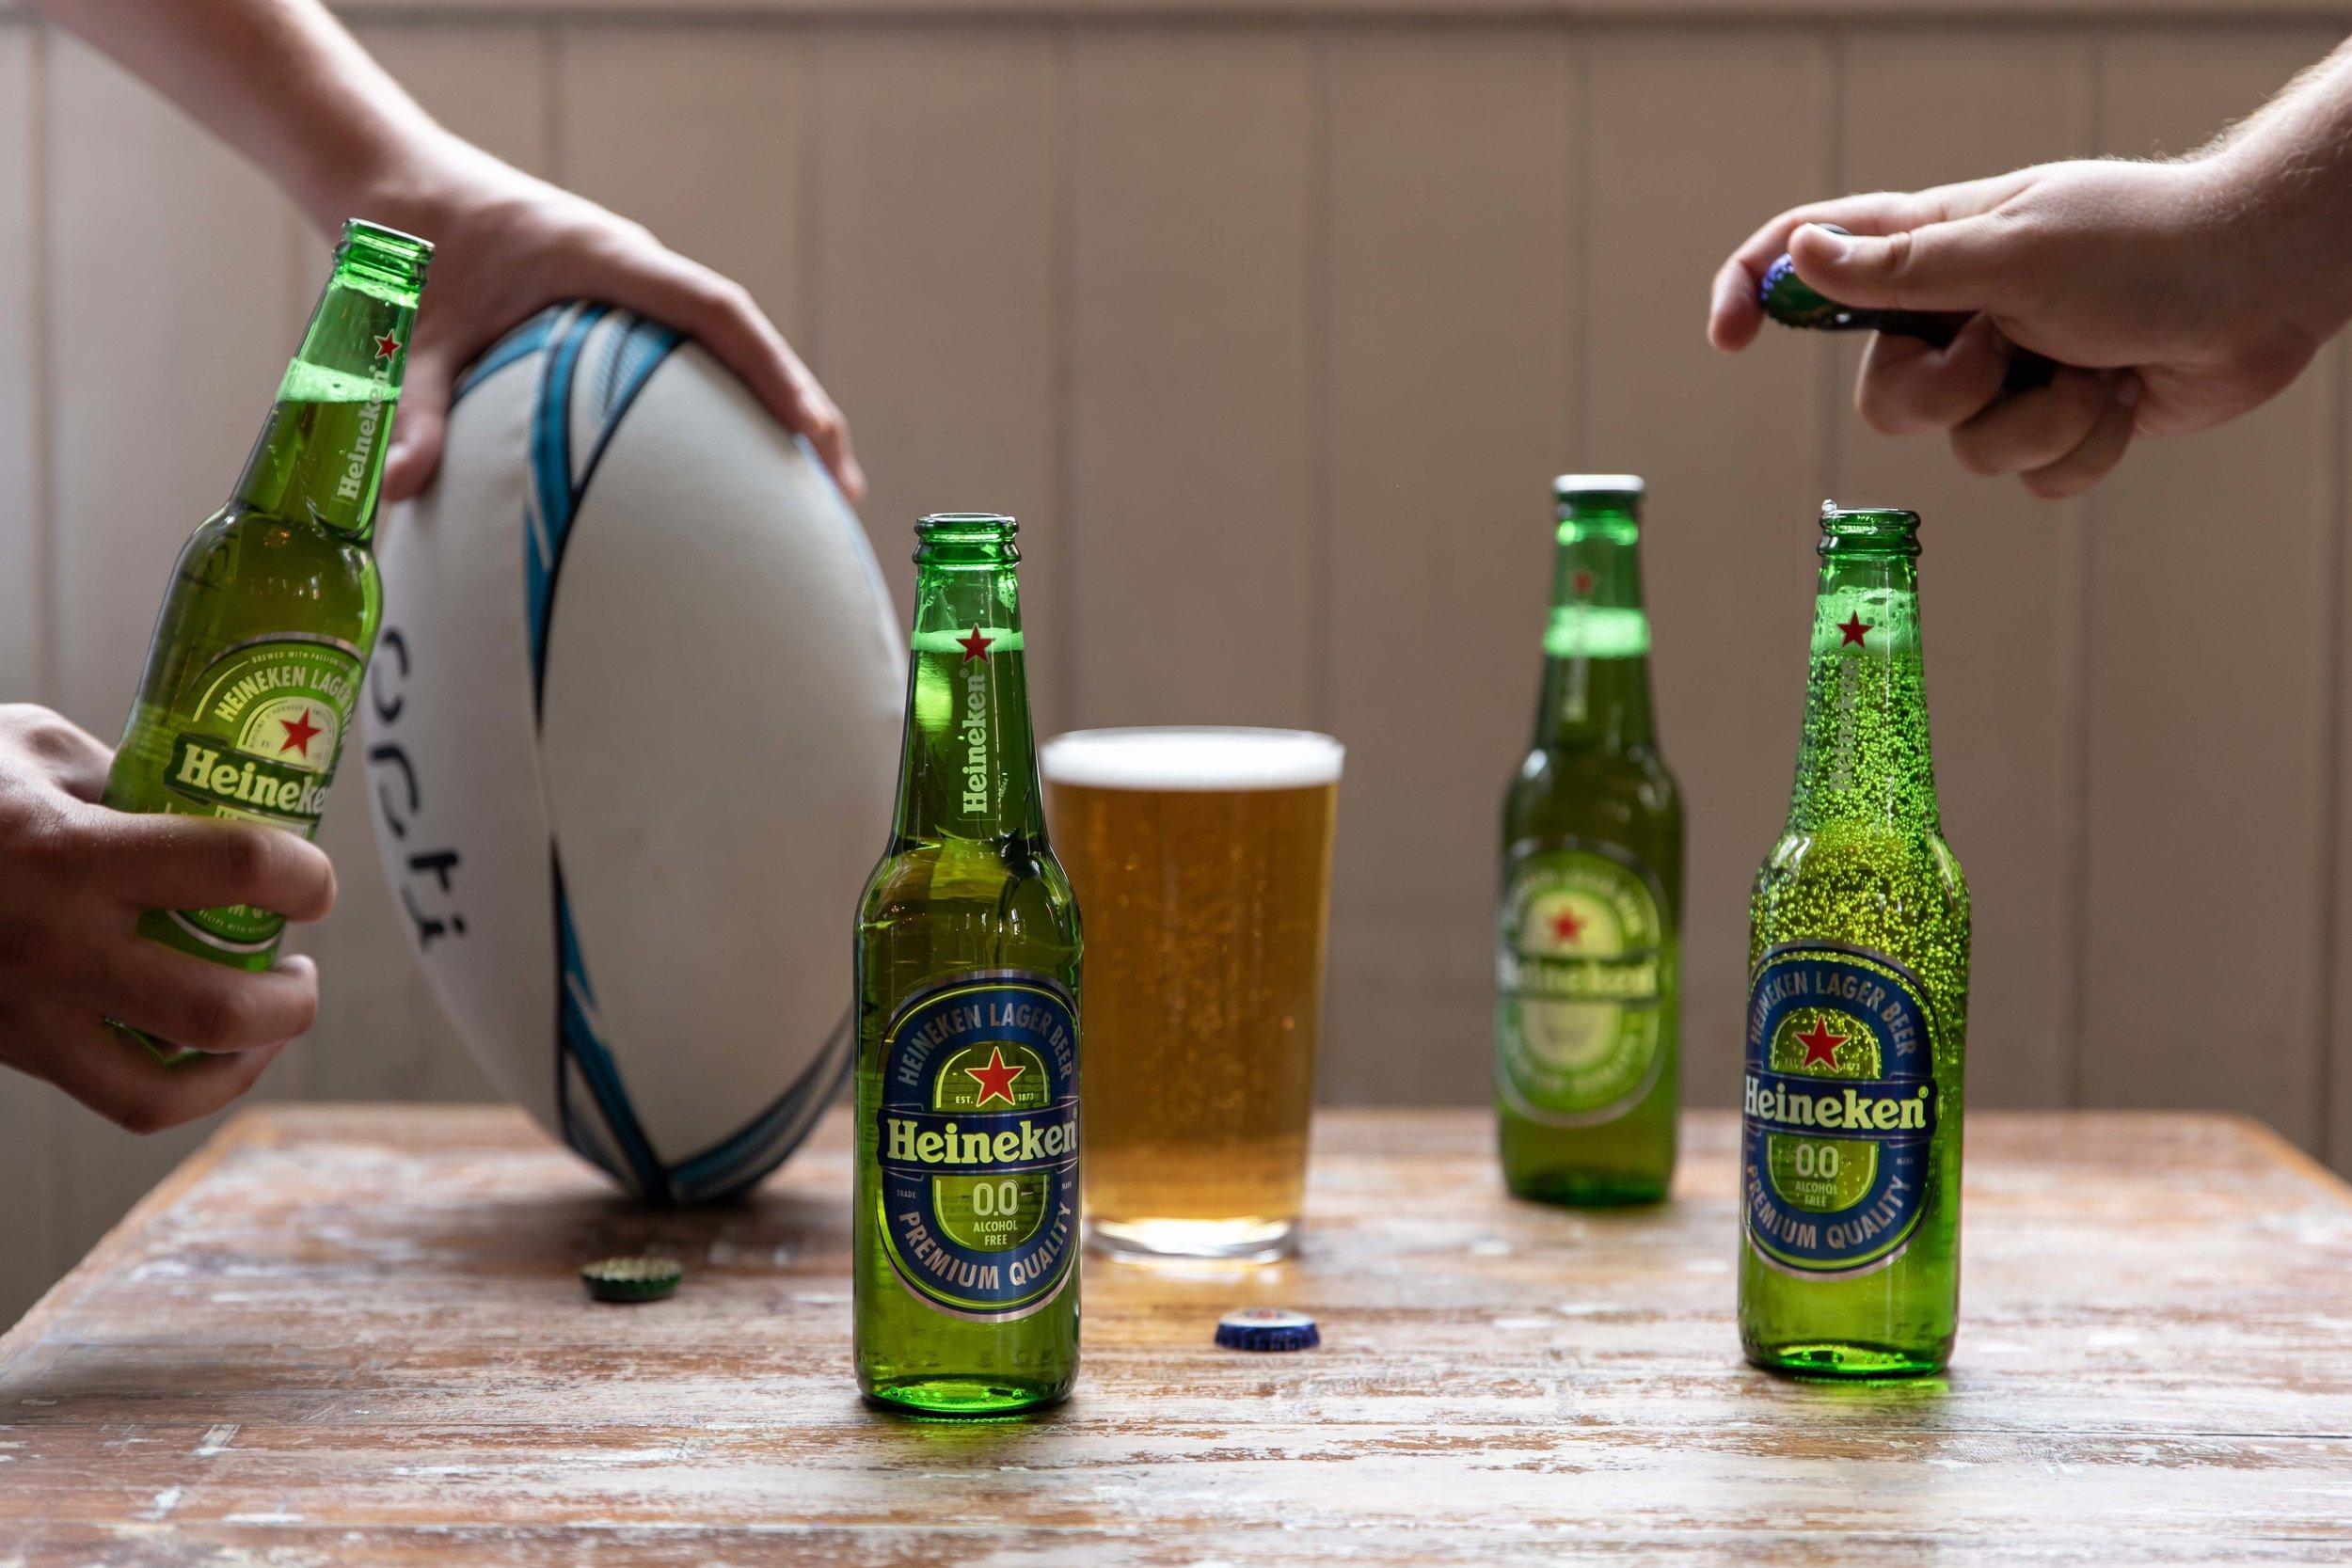 rugby urban pubs and bar1.jpg